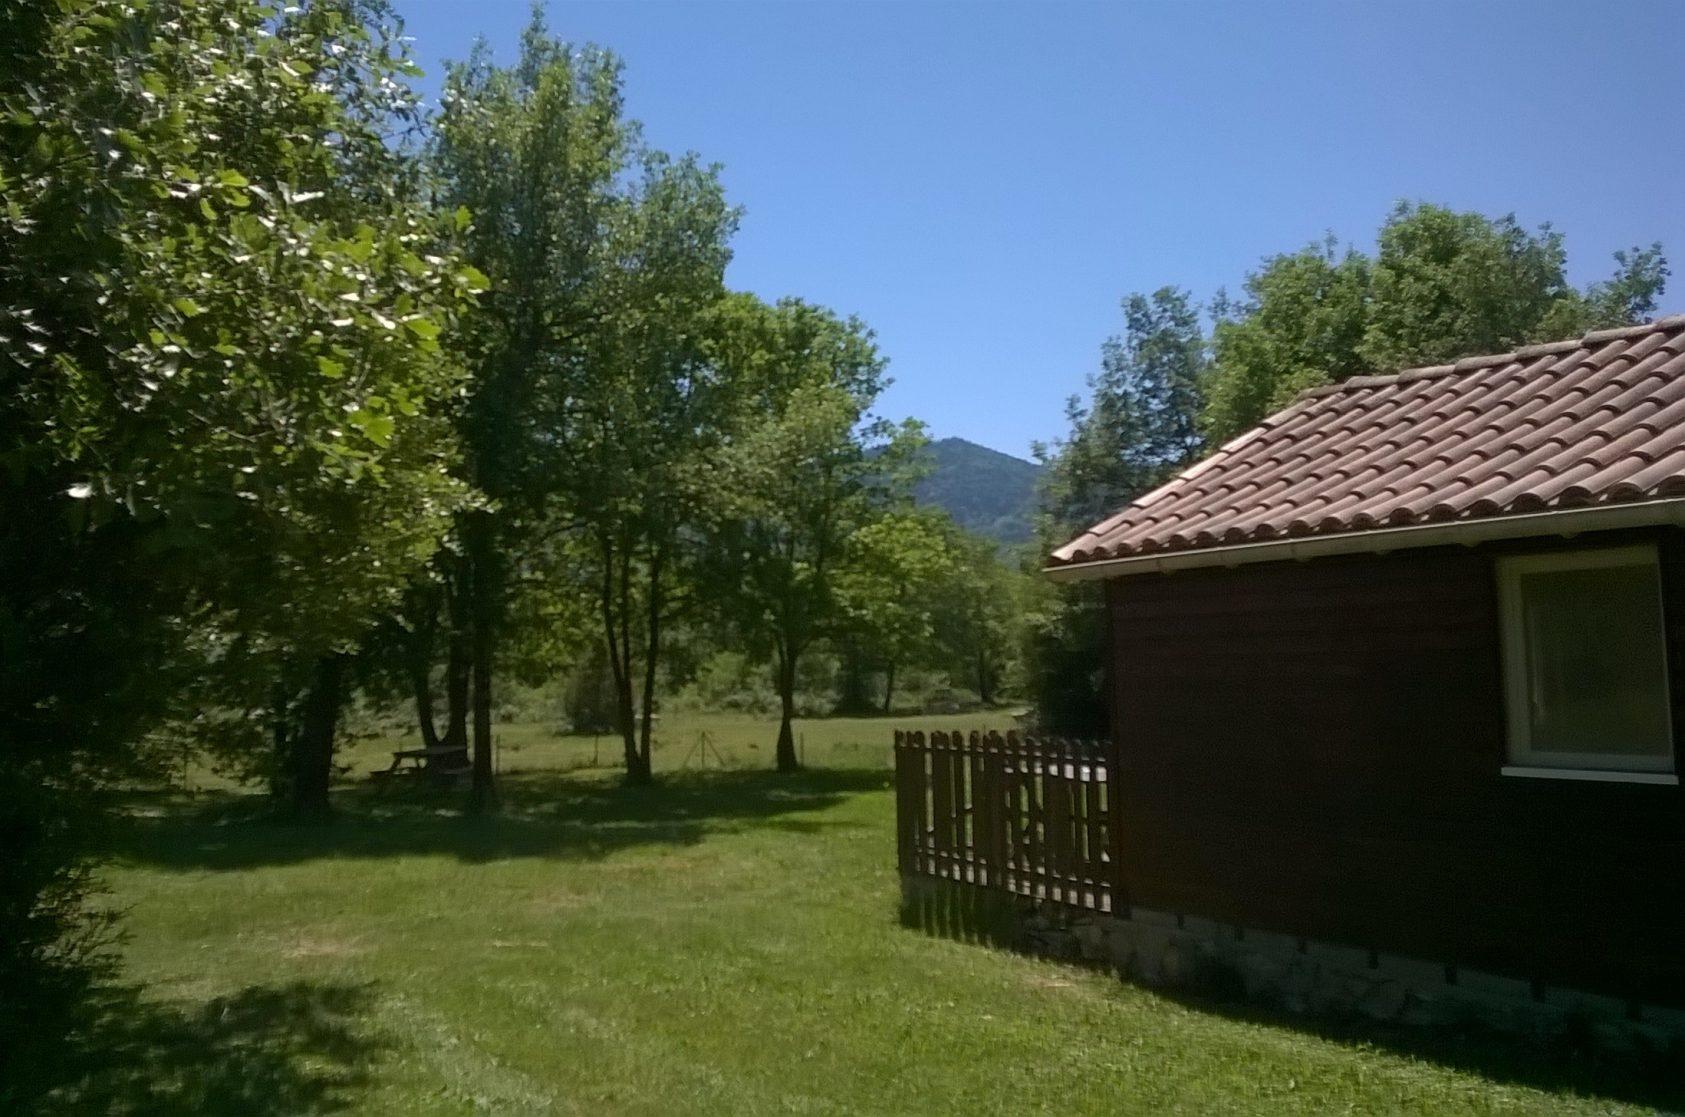 chalet vanaf camping pad top